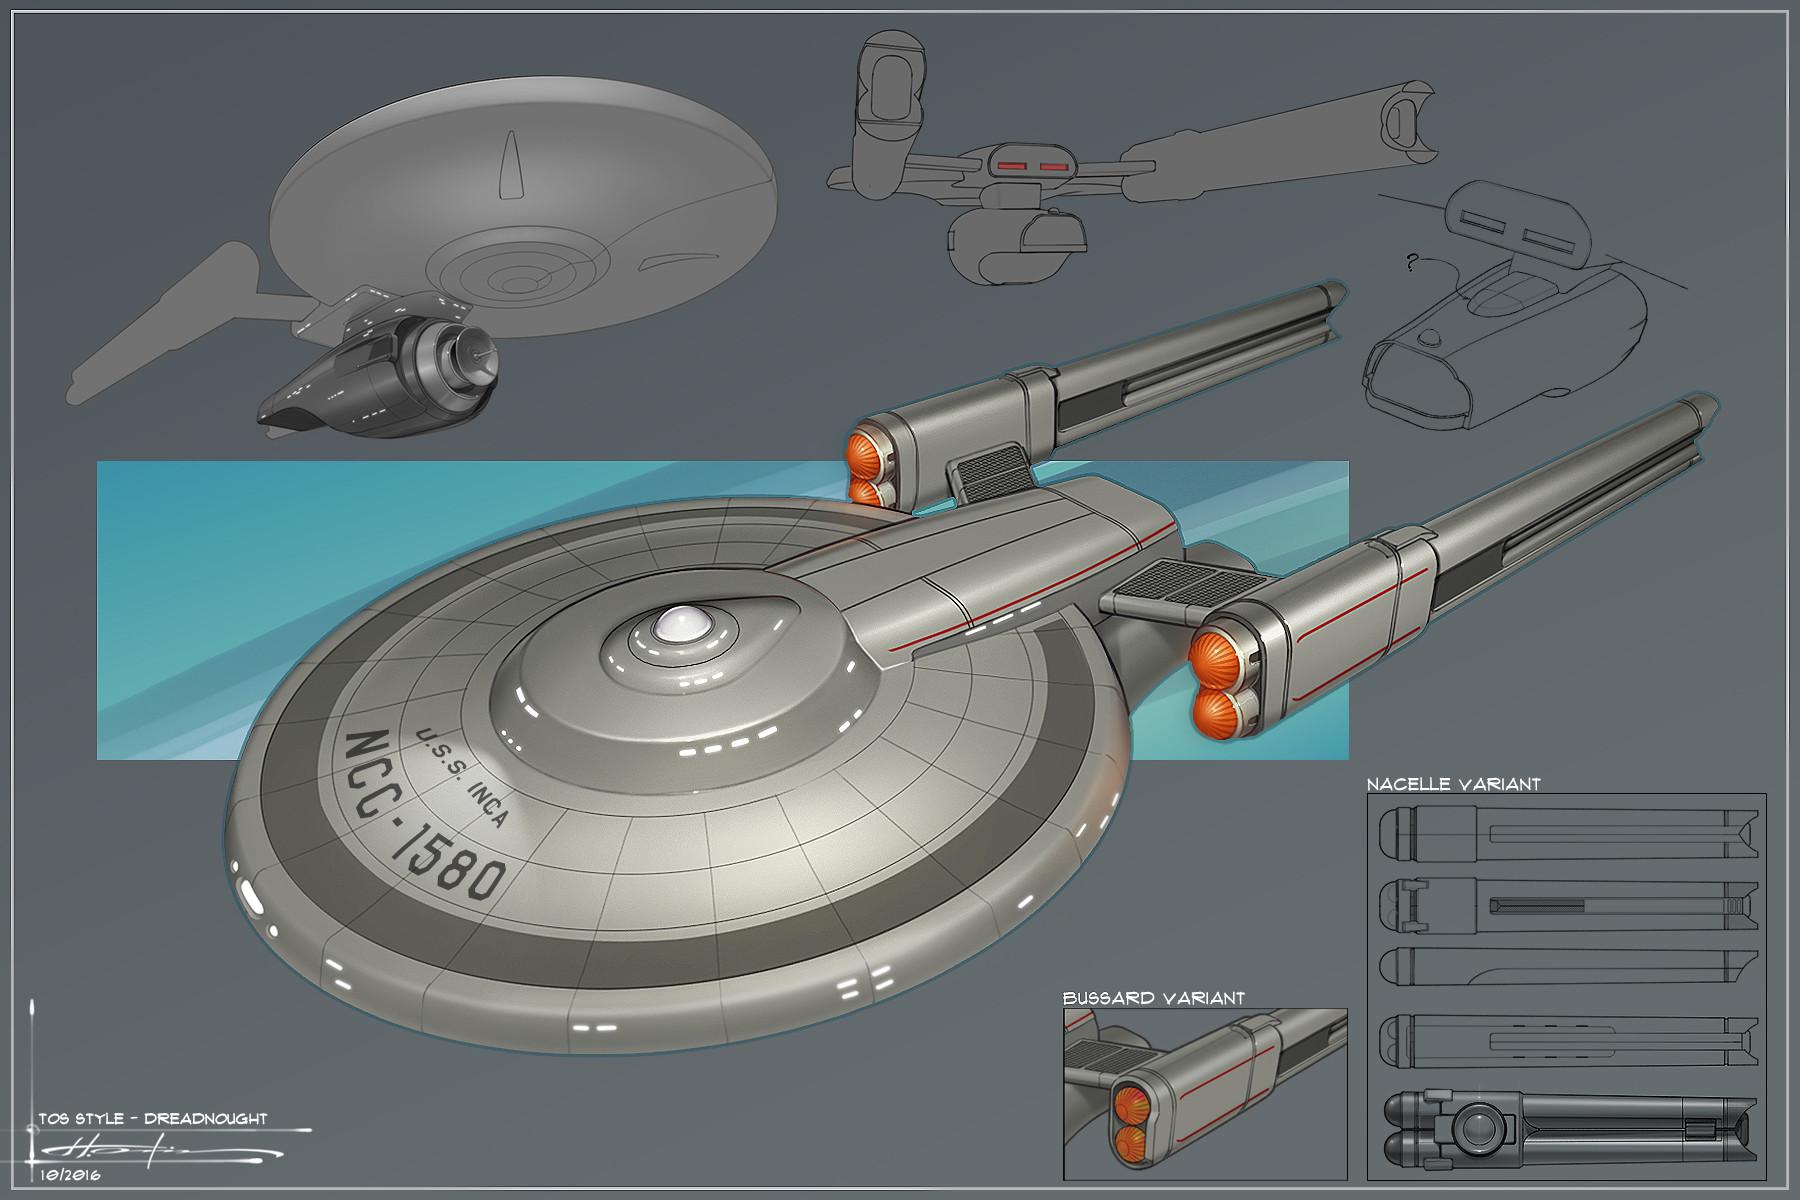 ArtStation - Atlas Class - Prototype Dreadnought Cruiser